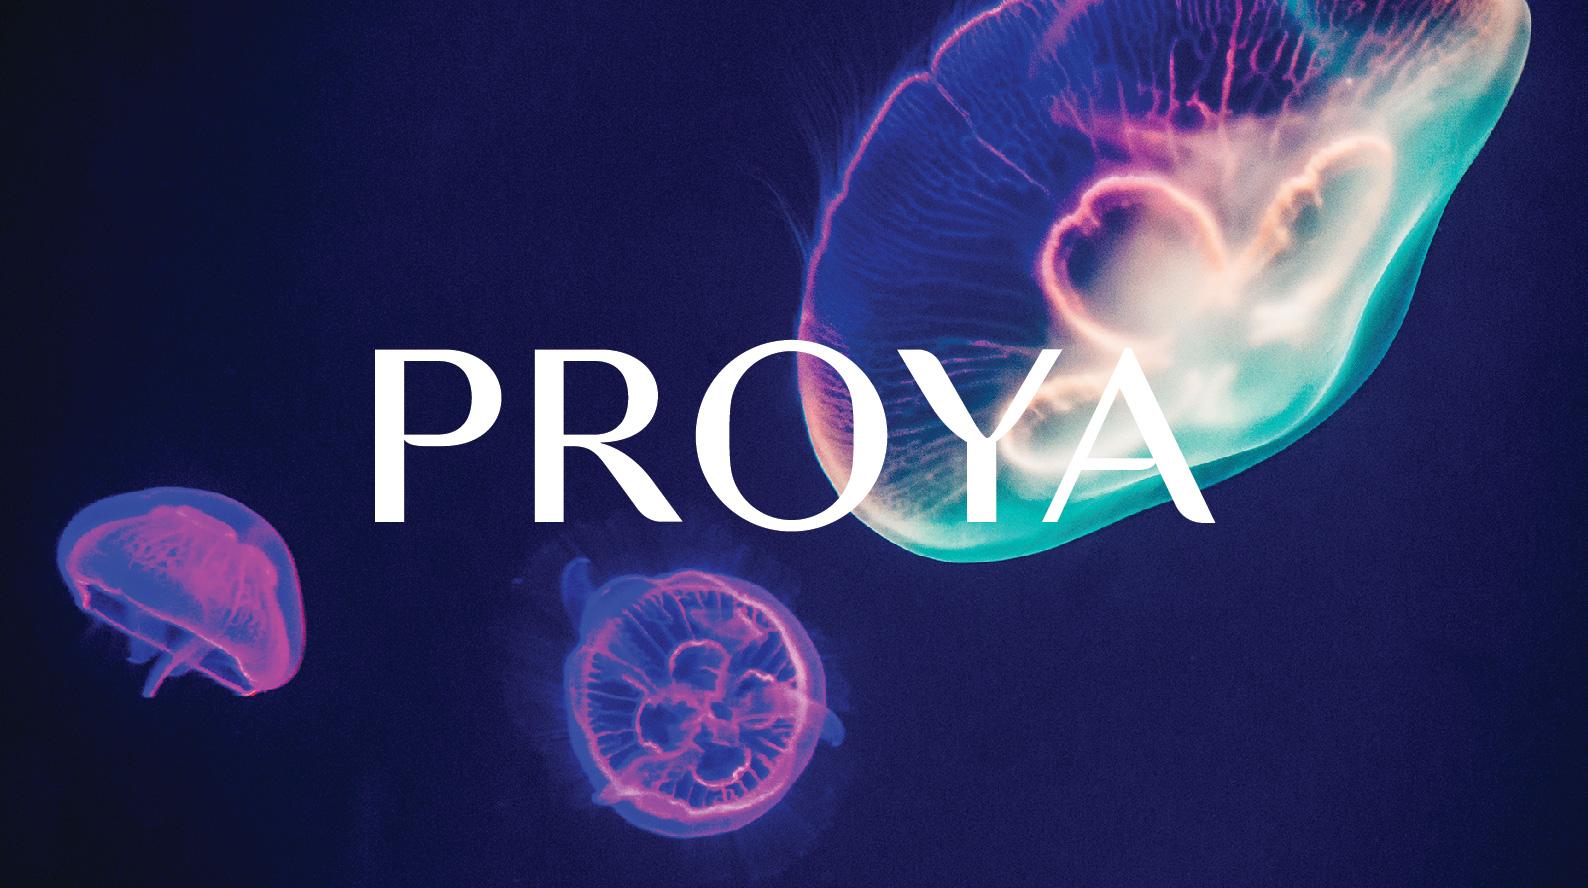 proya_00-2.jpg